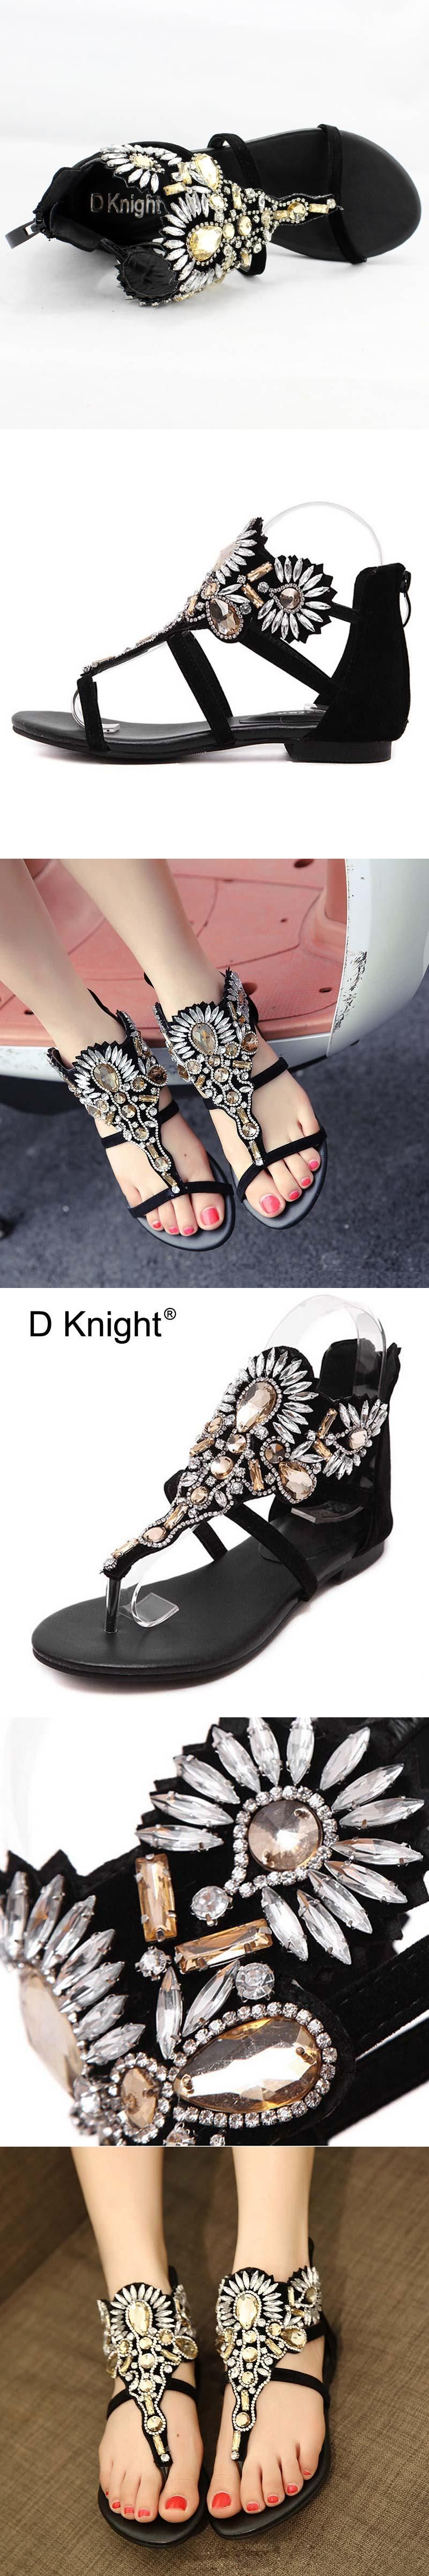 991f7f31924e Crystal Gladiator Sandals Women Summer Flip Flops Casual Shoes Woman Slip  On Flats Rhinestone Black Shoes Plus Size 35-40 E22